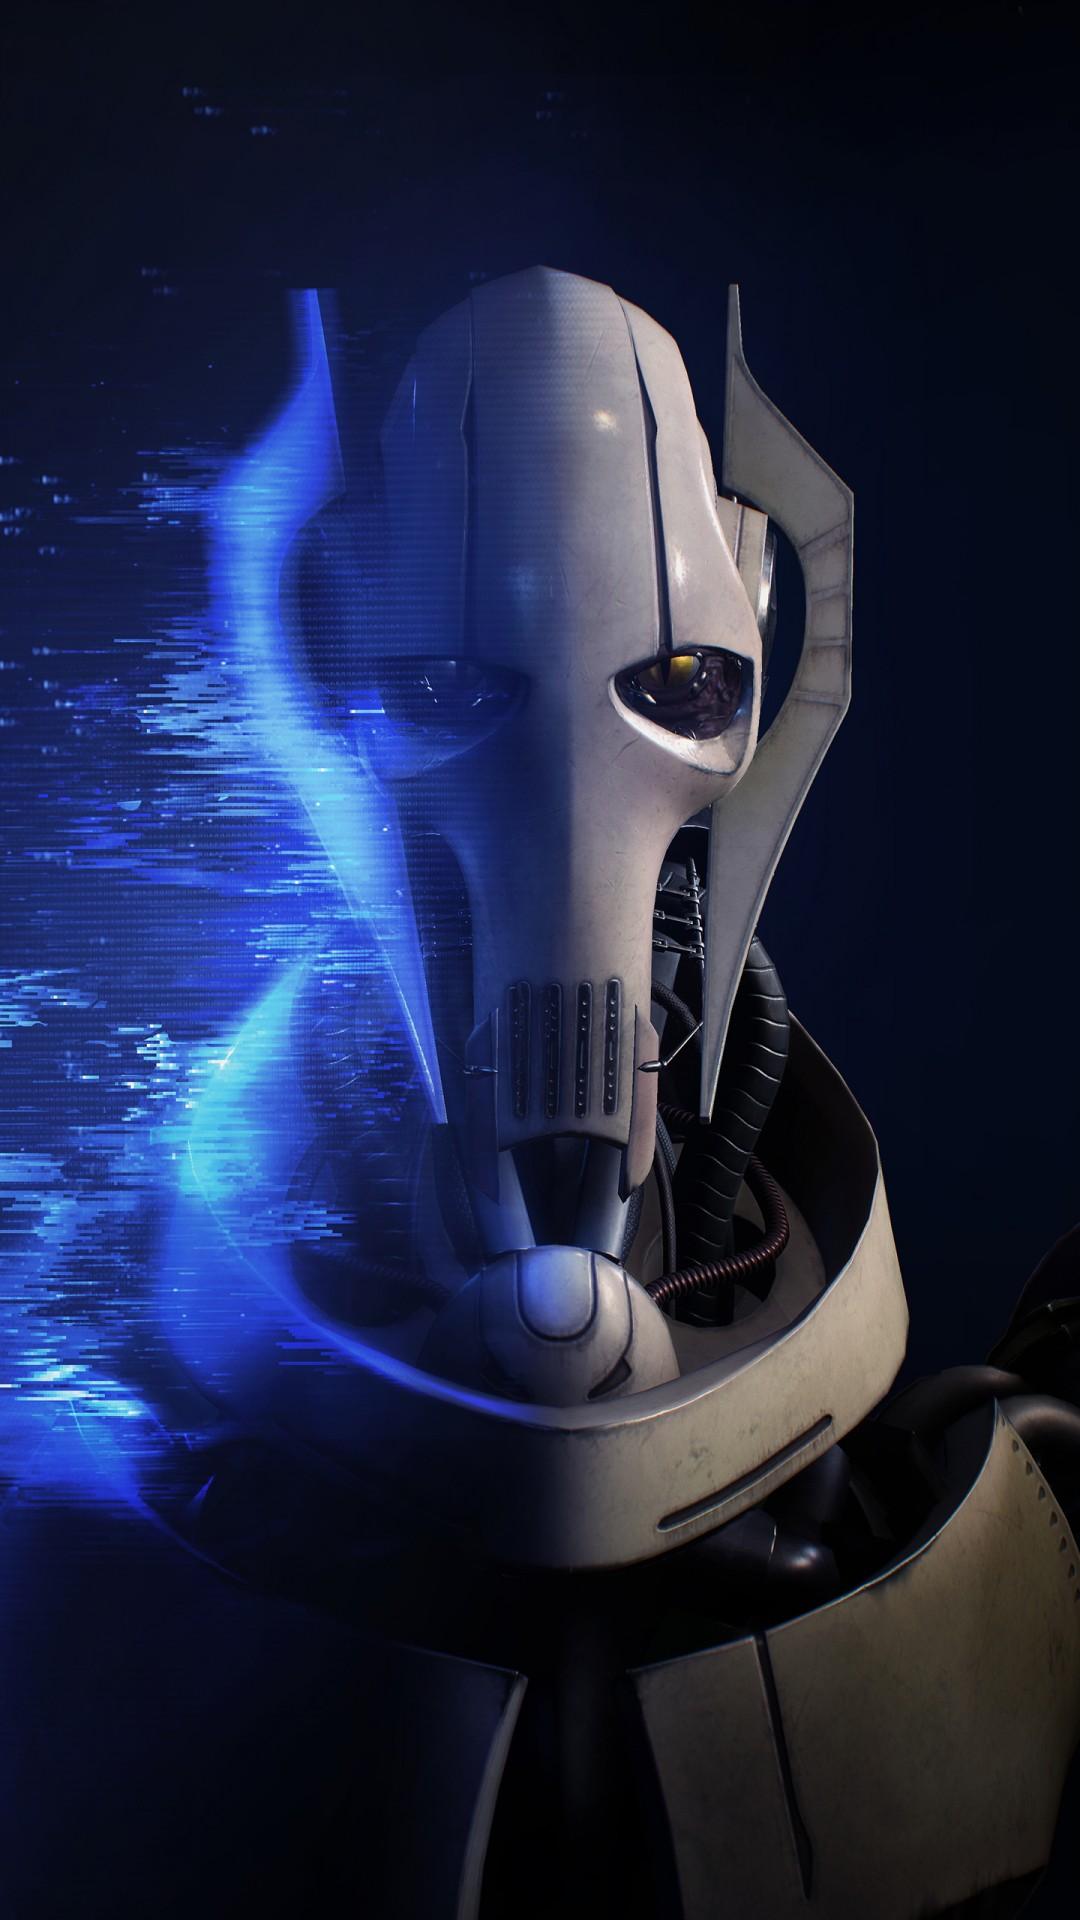 General Grievous In Star Wars Battlefront II 5K Wallpapers HD Wallpapers ID 24869